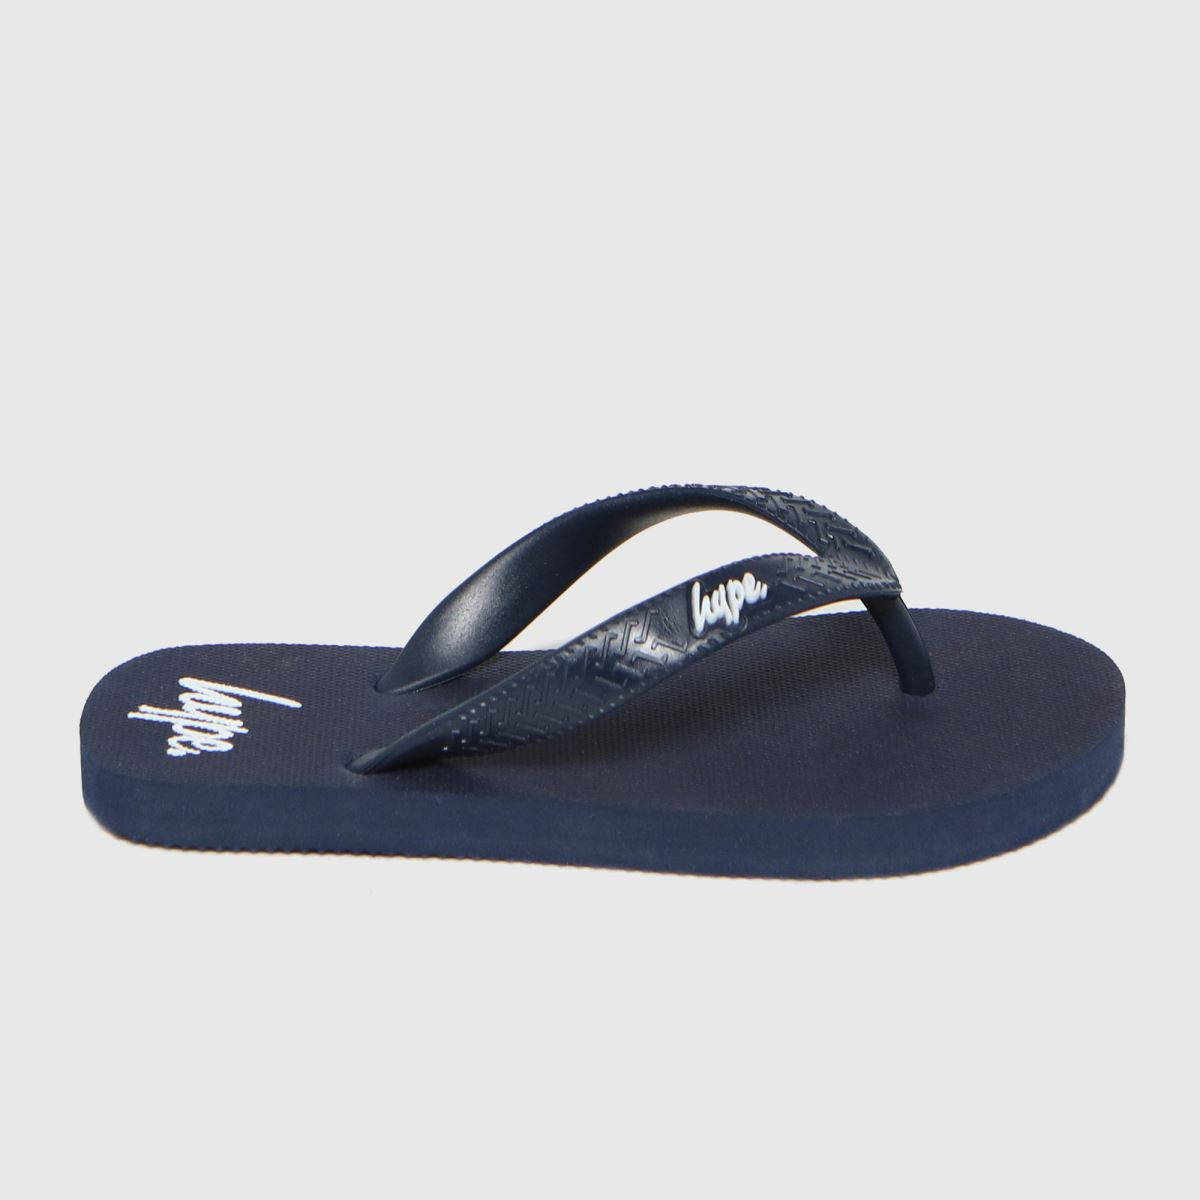 Hype Navy Flip Flops Sliders Youth